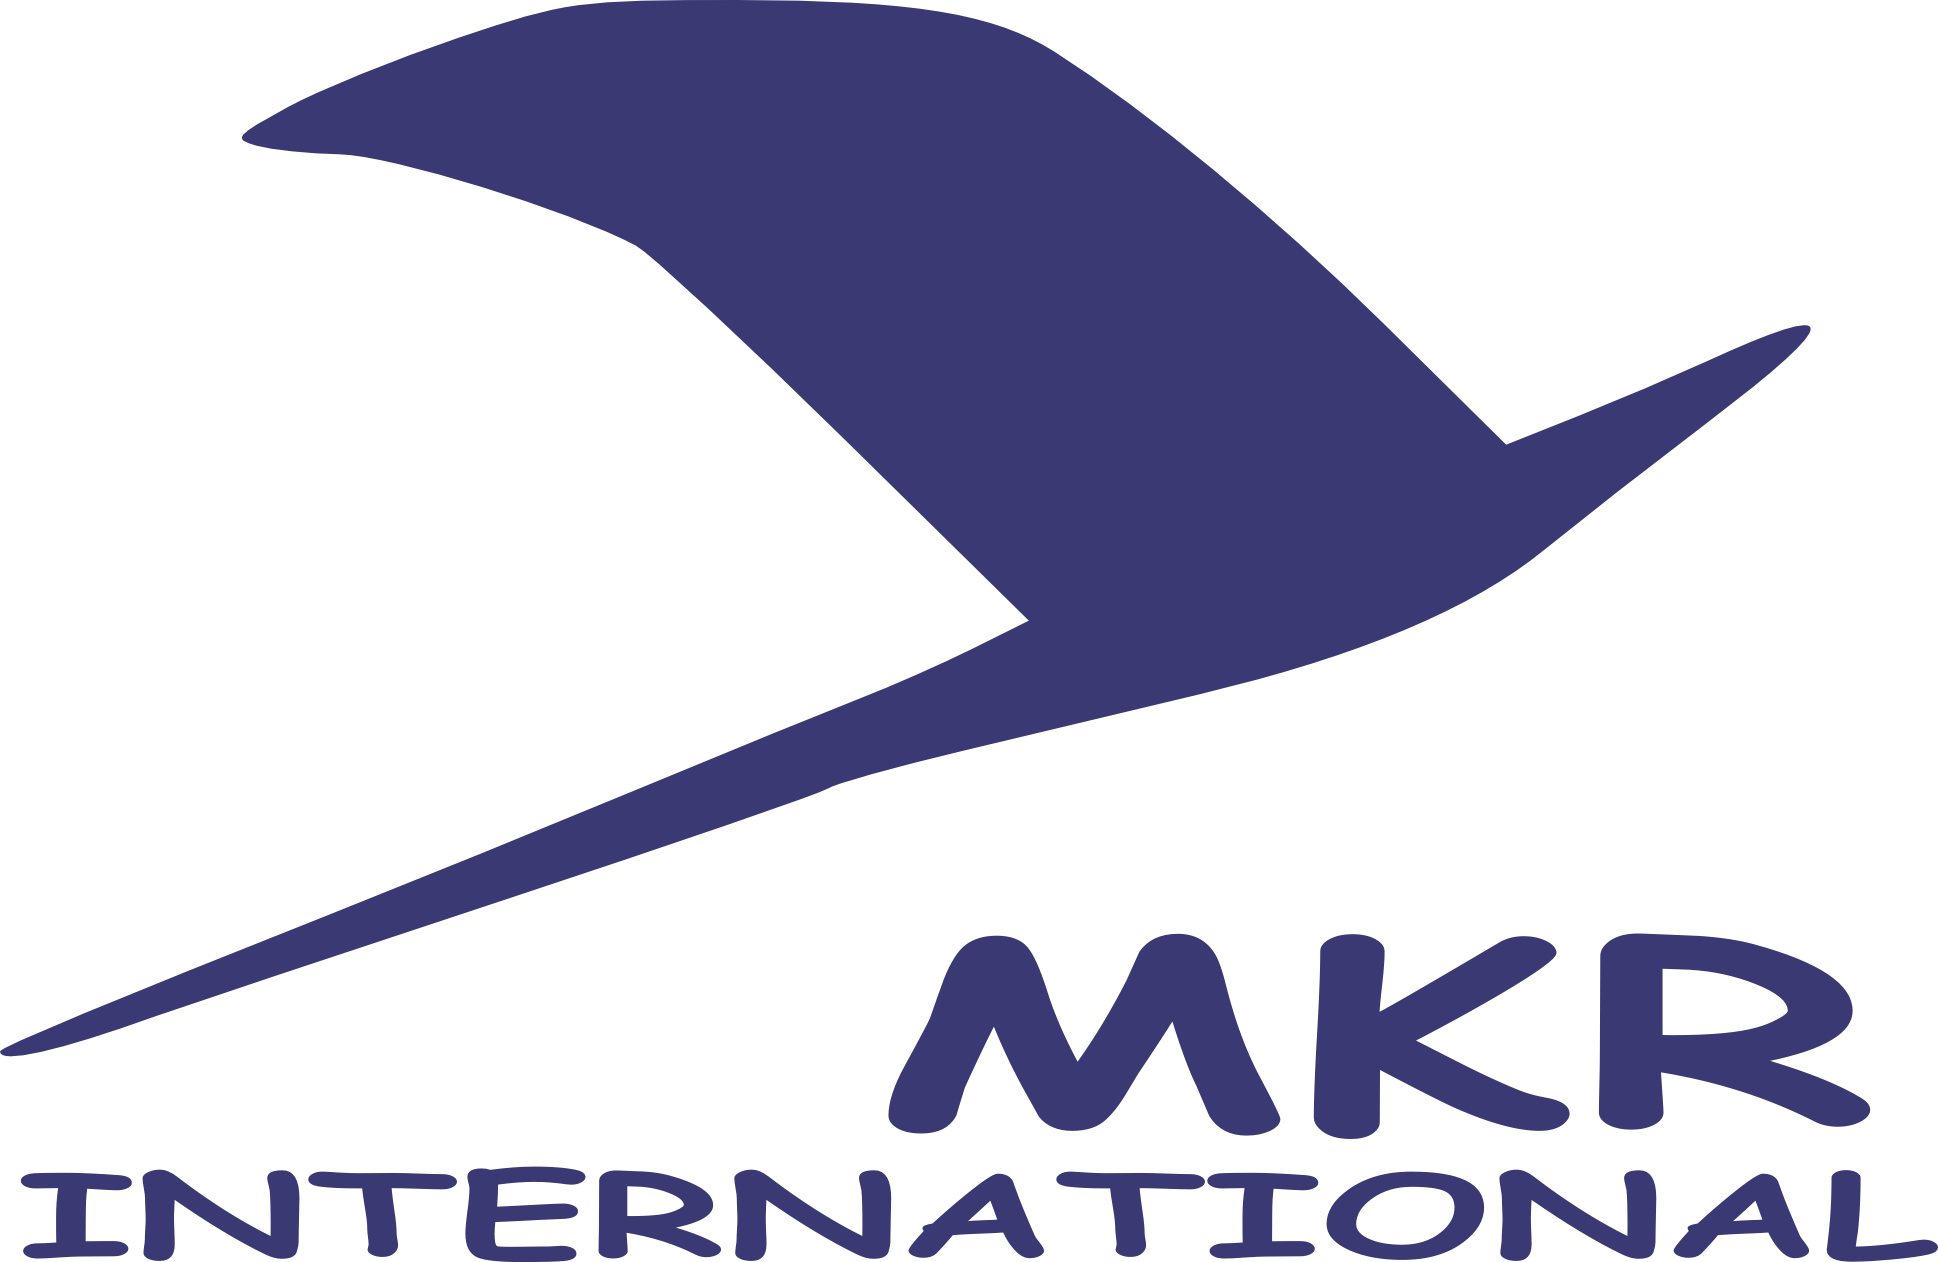 mkr - photo #4